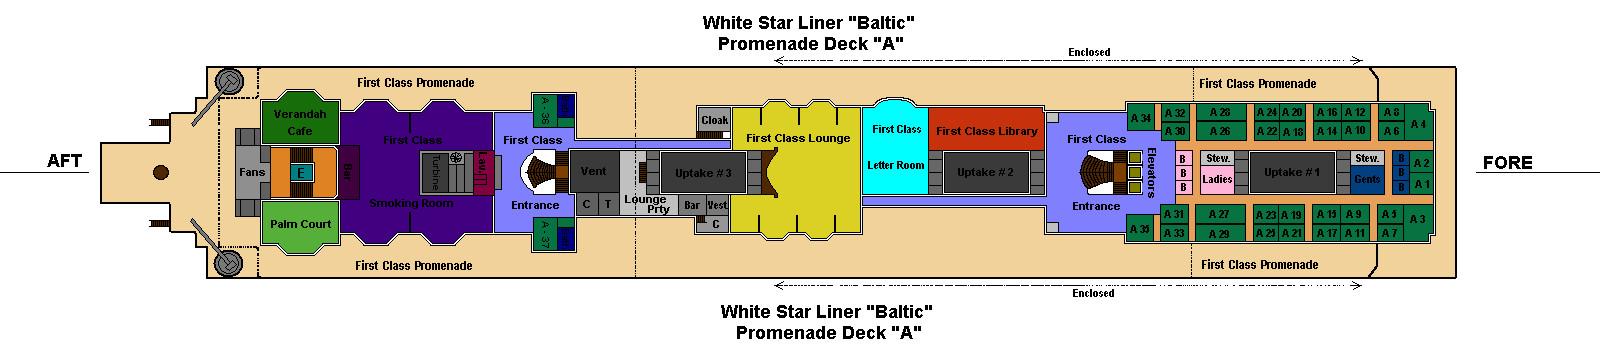 Rms Baltic A Deck By Alderrancity34 On Deviantart